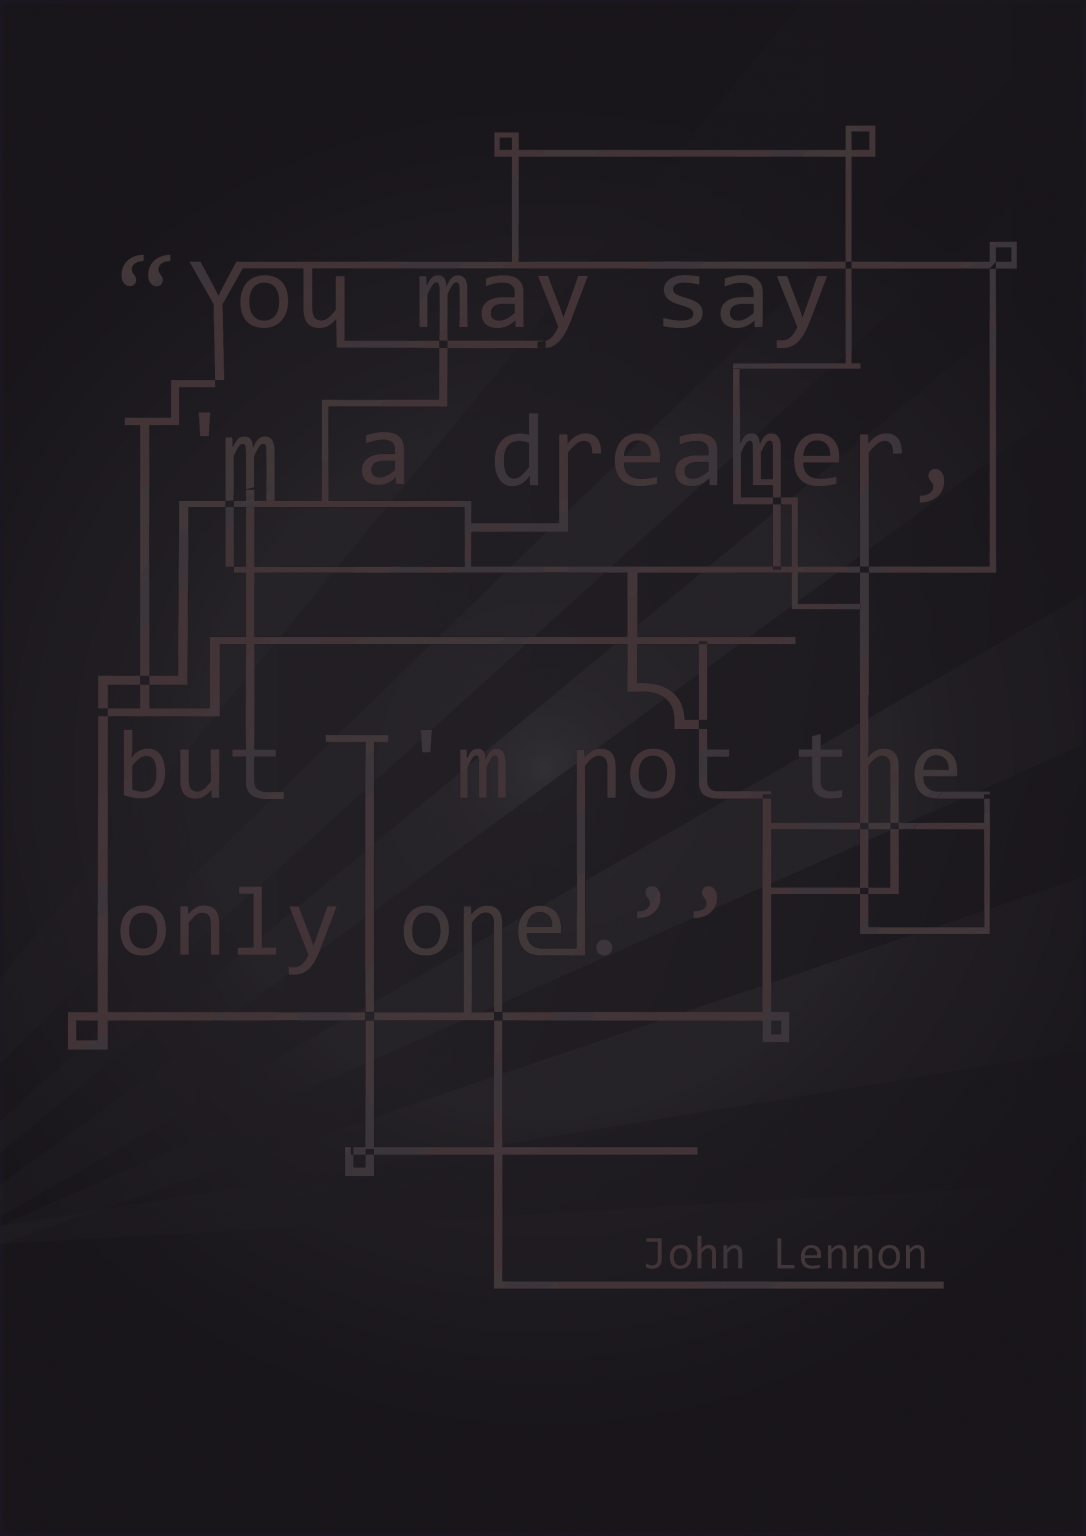 John Lennon Vintage Quote Poster